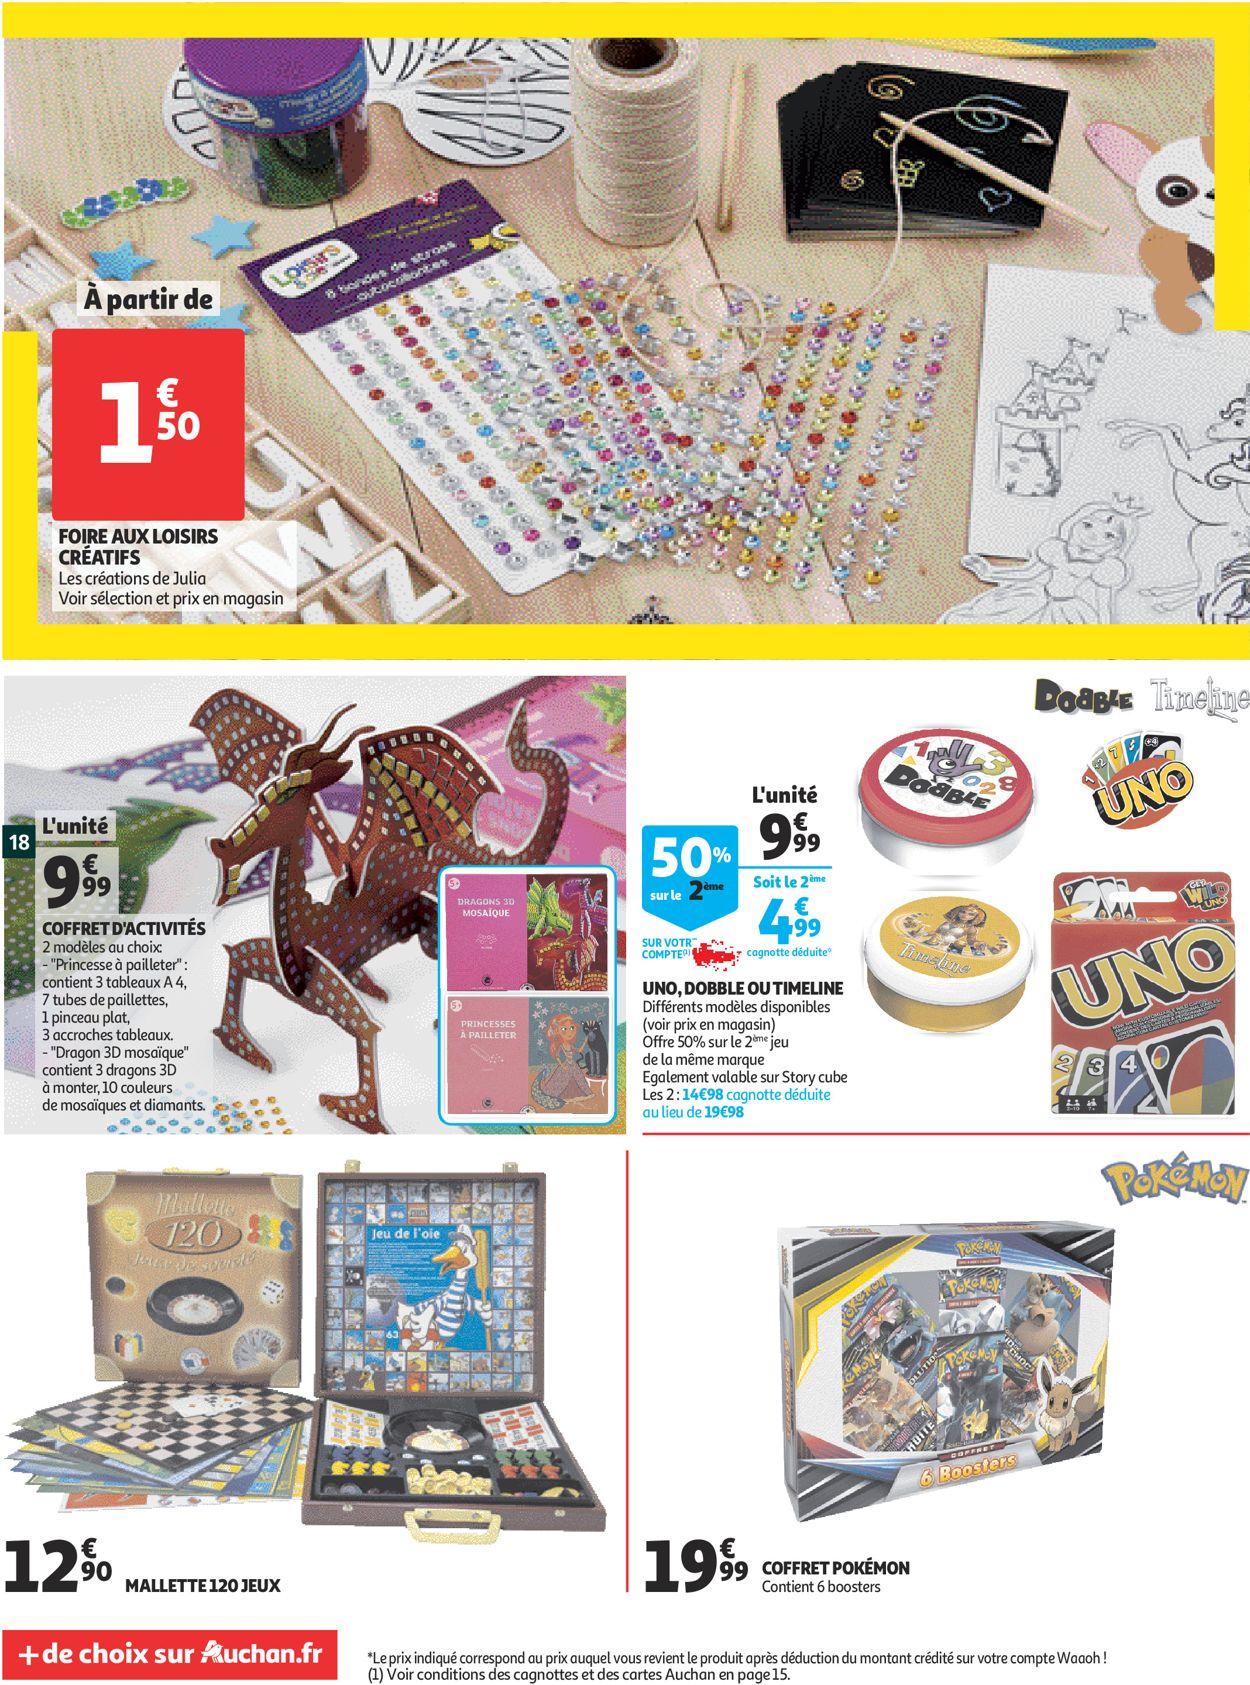 Auchan Catalogue - 26.02-03.03.2020 (Page 18)